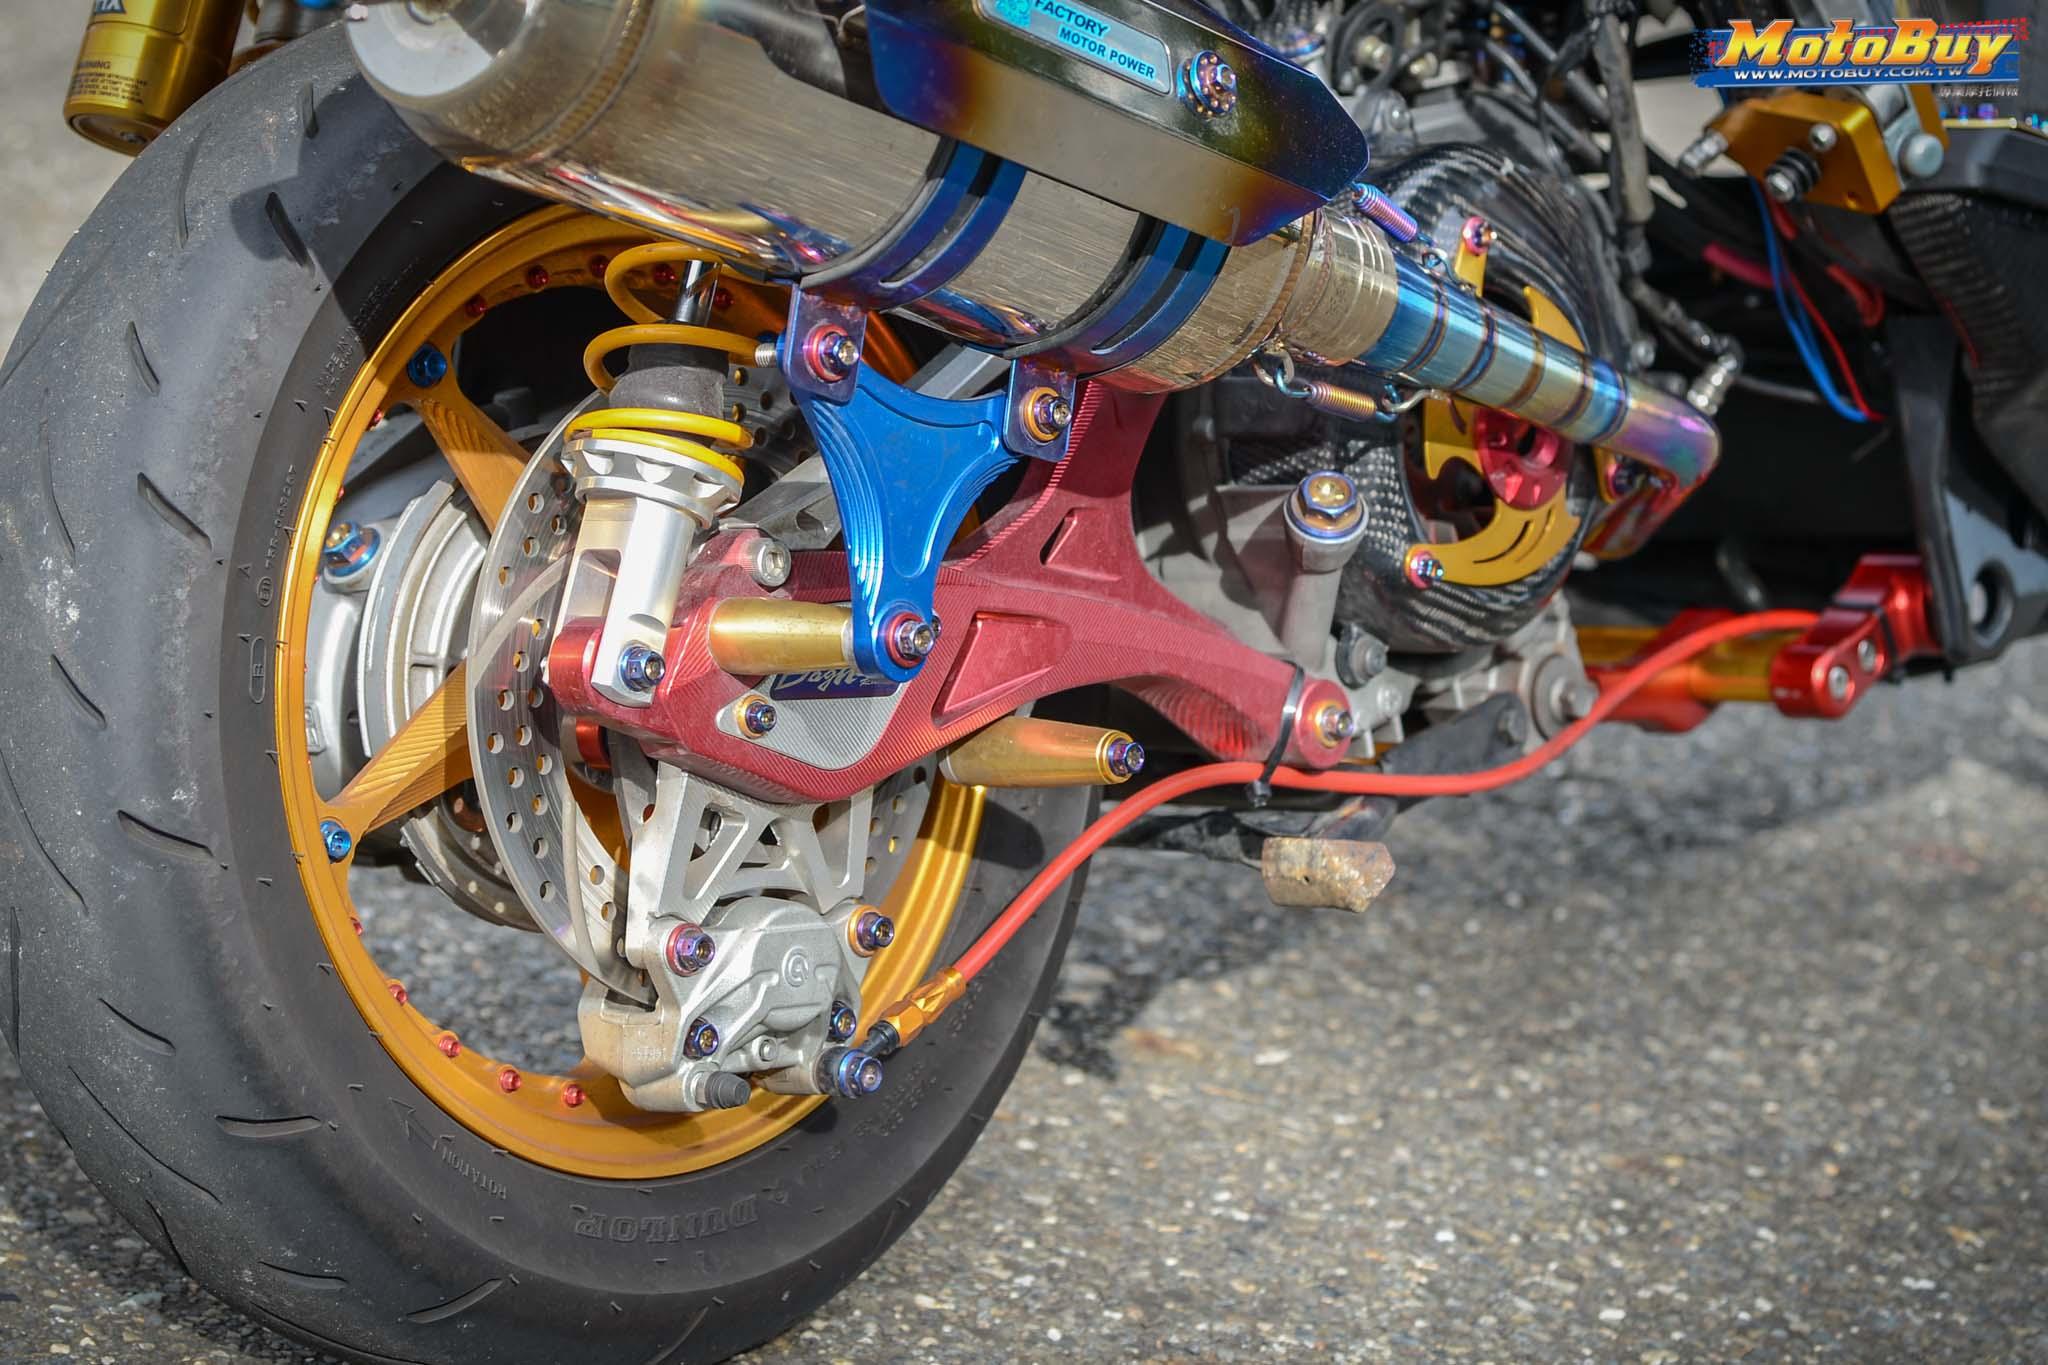 [夯車分享] 我是鋼鐵人 - YAMAHA BWSX 125   MotoBuy